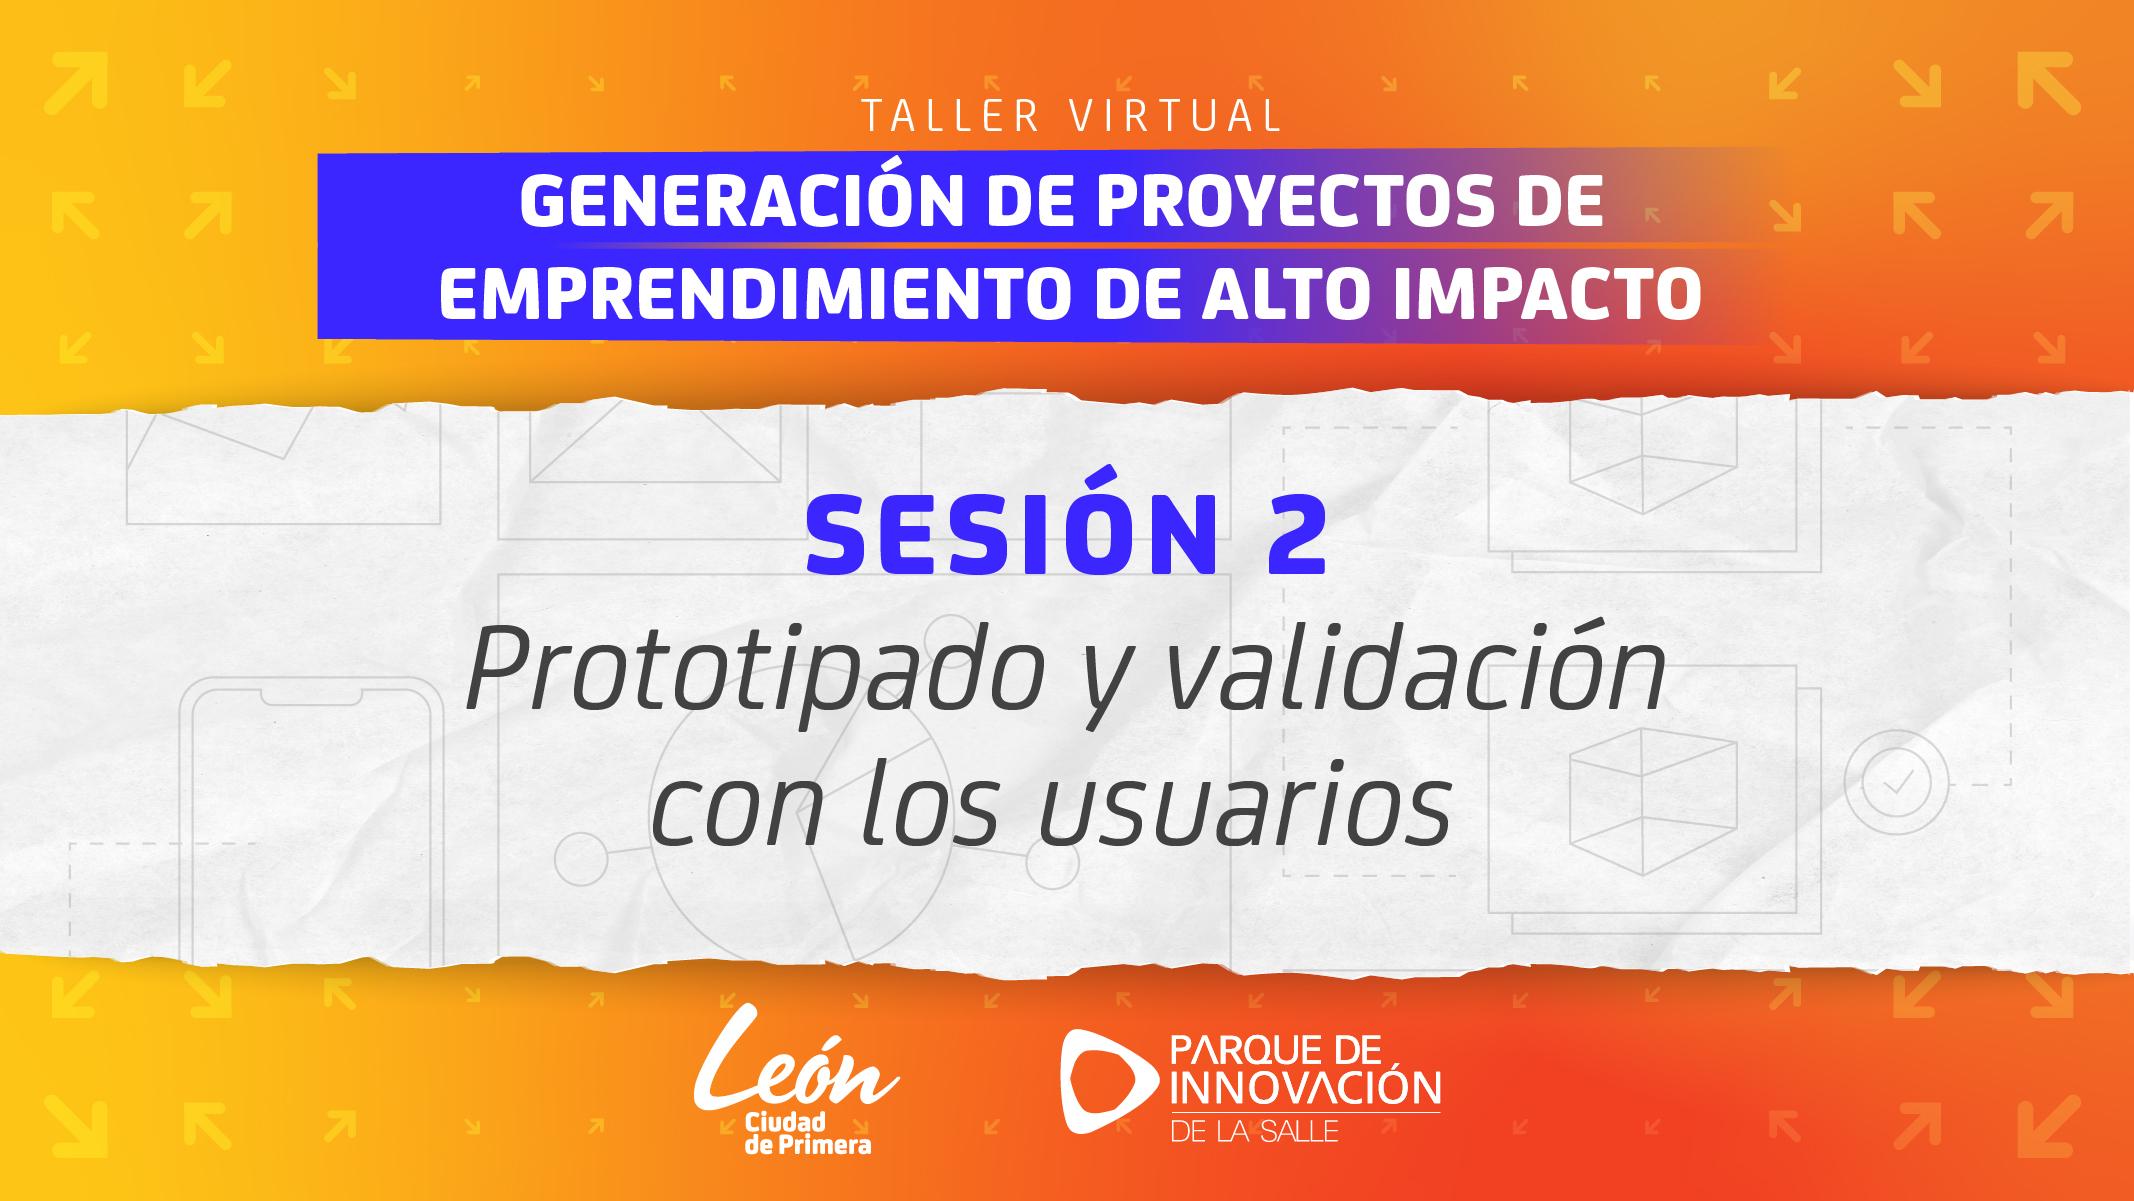 Sesión 2 – Taller de proyectos de emprendimiento de alto impacto